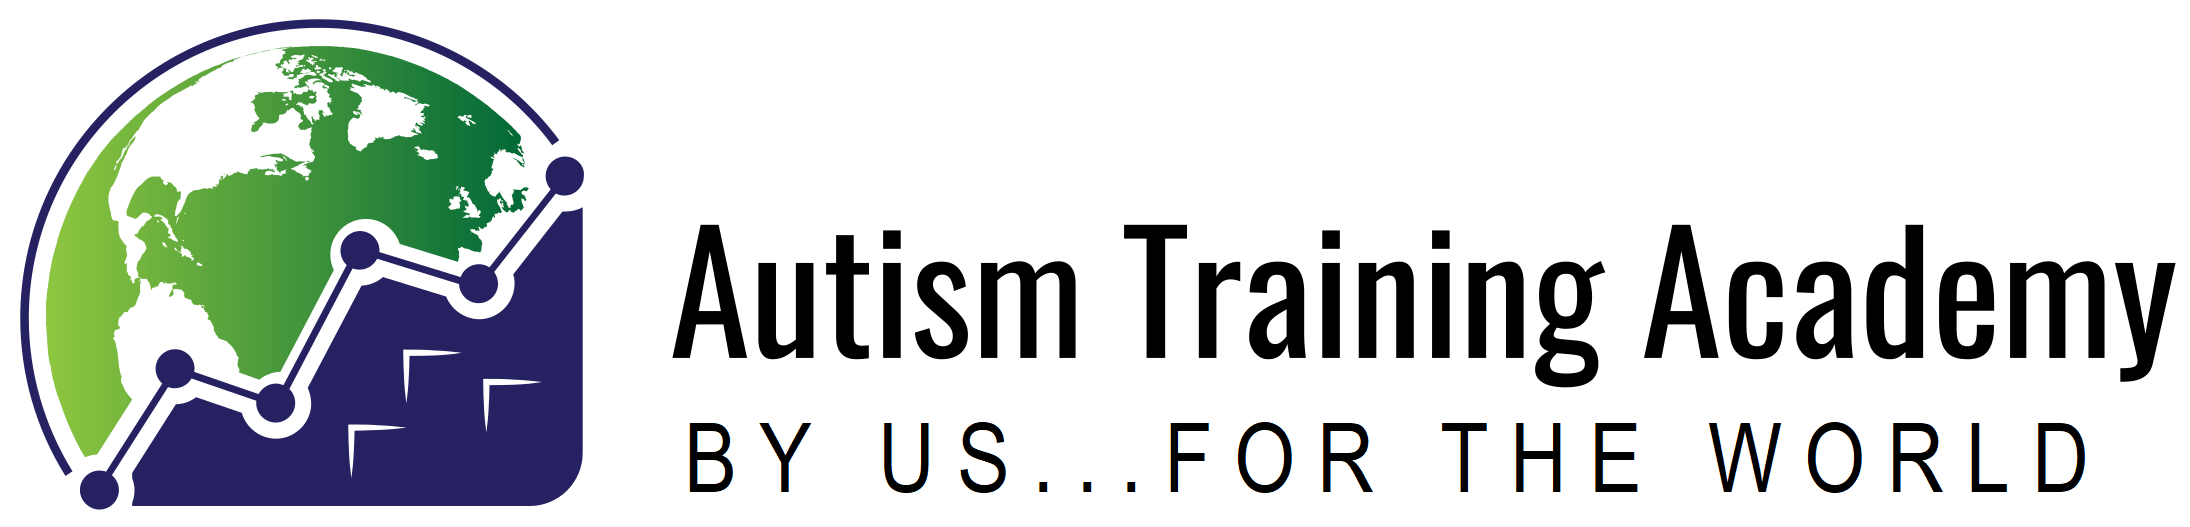 Autism Training Academy